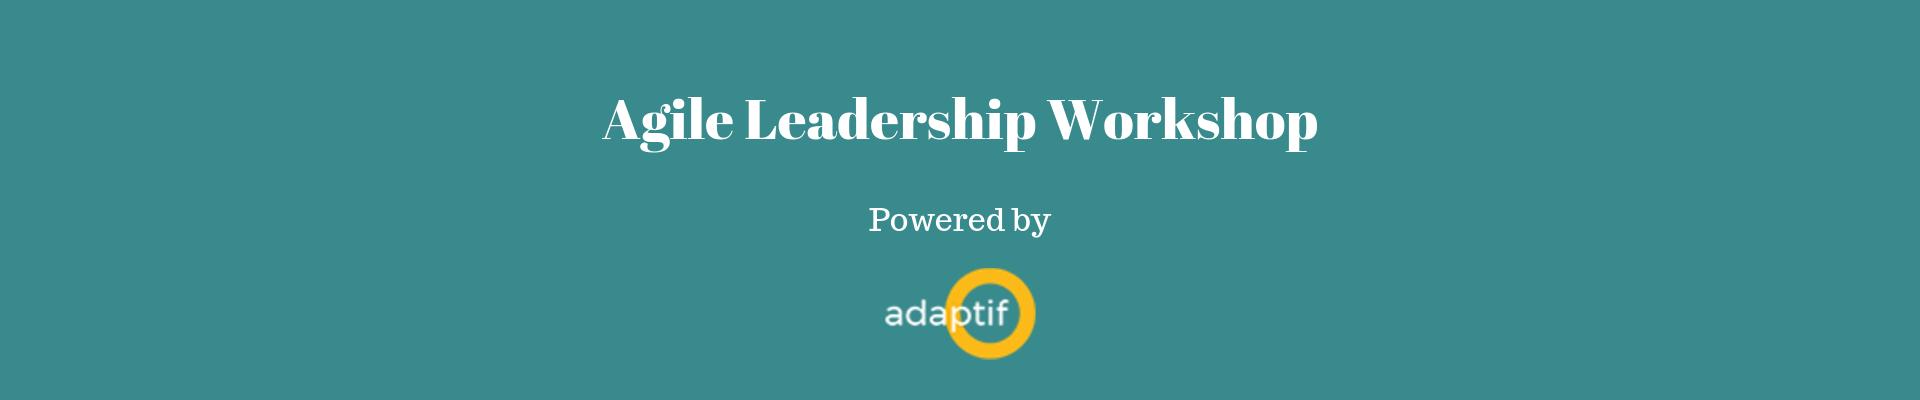 Adaptif Agile Leadership Workshop